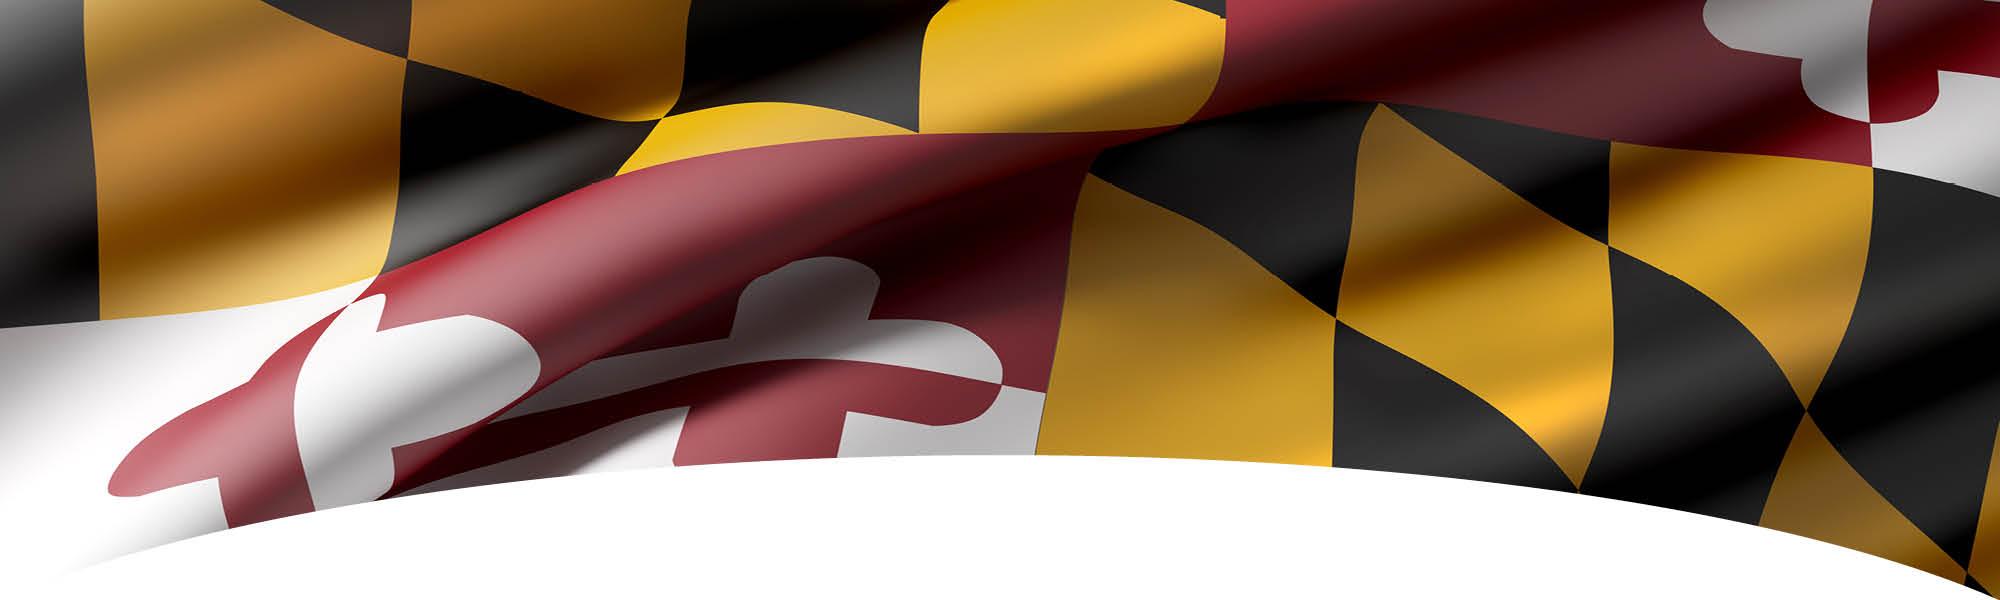 Maryland Community Fellows - Maryland State Flag